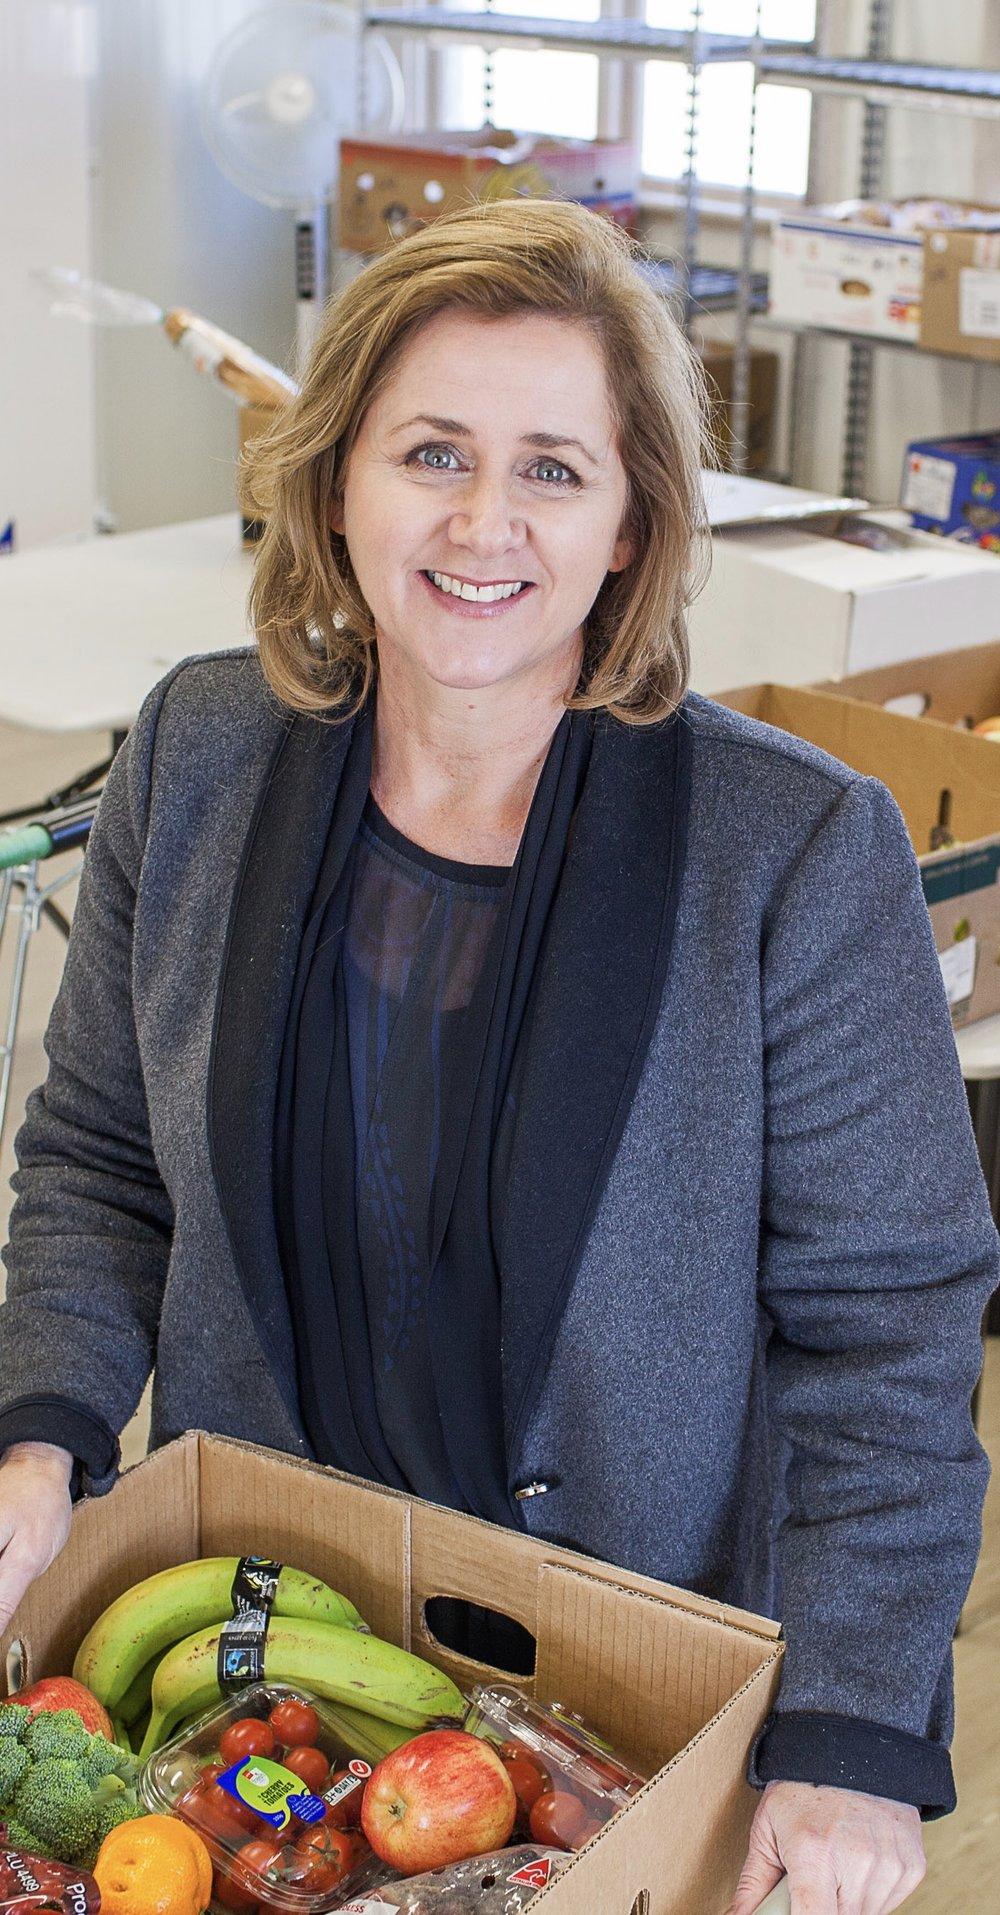 1 June 2016: Foodshare. Deborah Manning CEO of Foodshare in the Dunedin Foodshare base where volunteers sort boxes of food. Photo Sharron Bennett